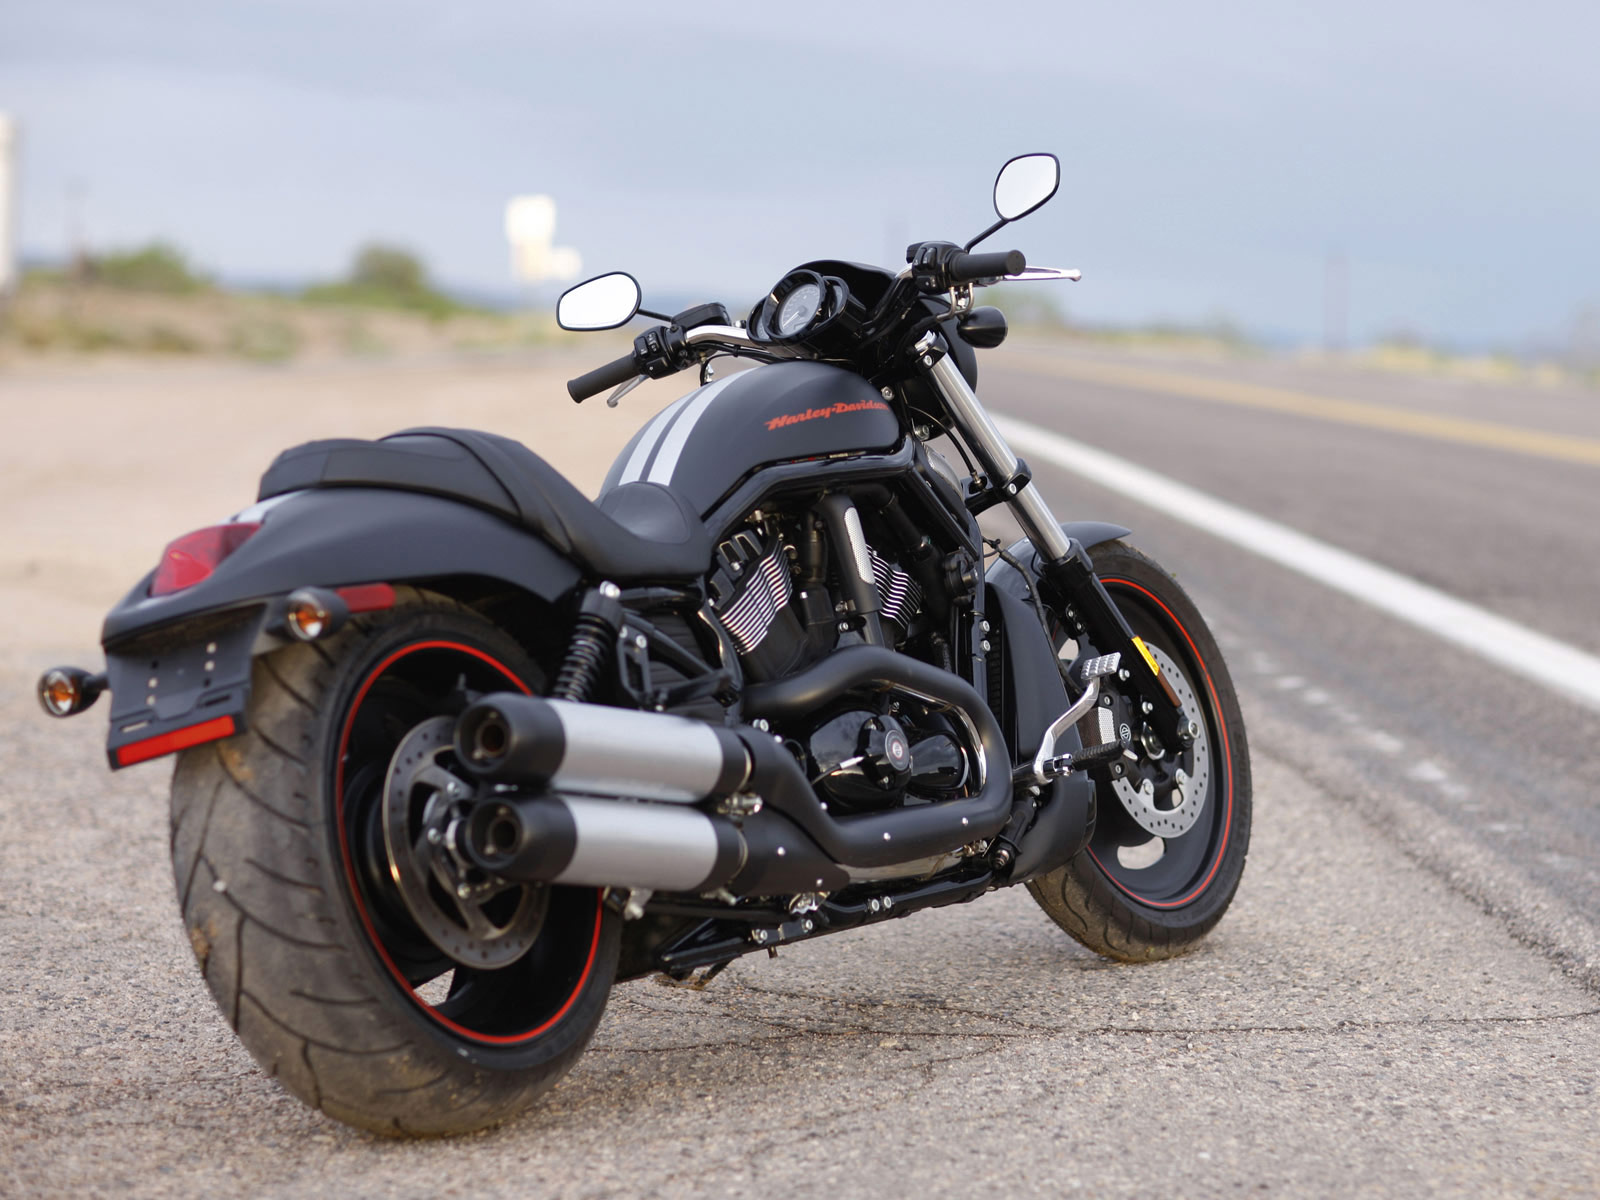 Compare a harley davidson v rod muscle vrscf 2009 a 2017 com outra - Compare A Harley Davidson V Rod Vrscdx Night Rod Special 2007 A 2018 Com Outra Moto